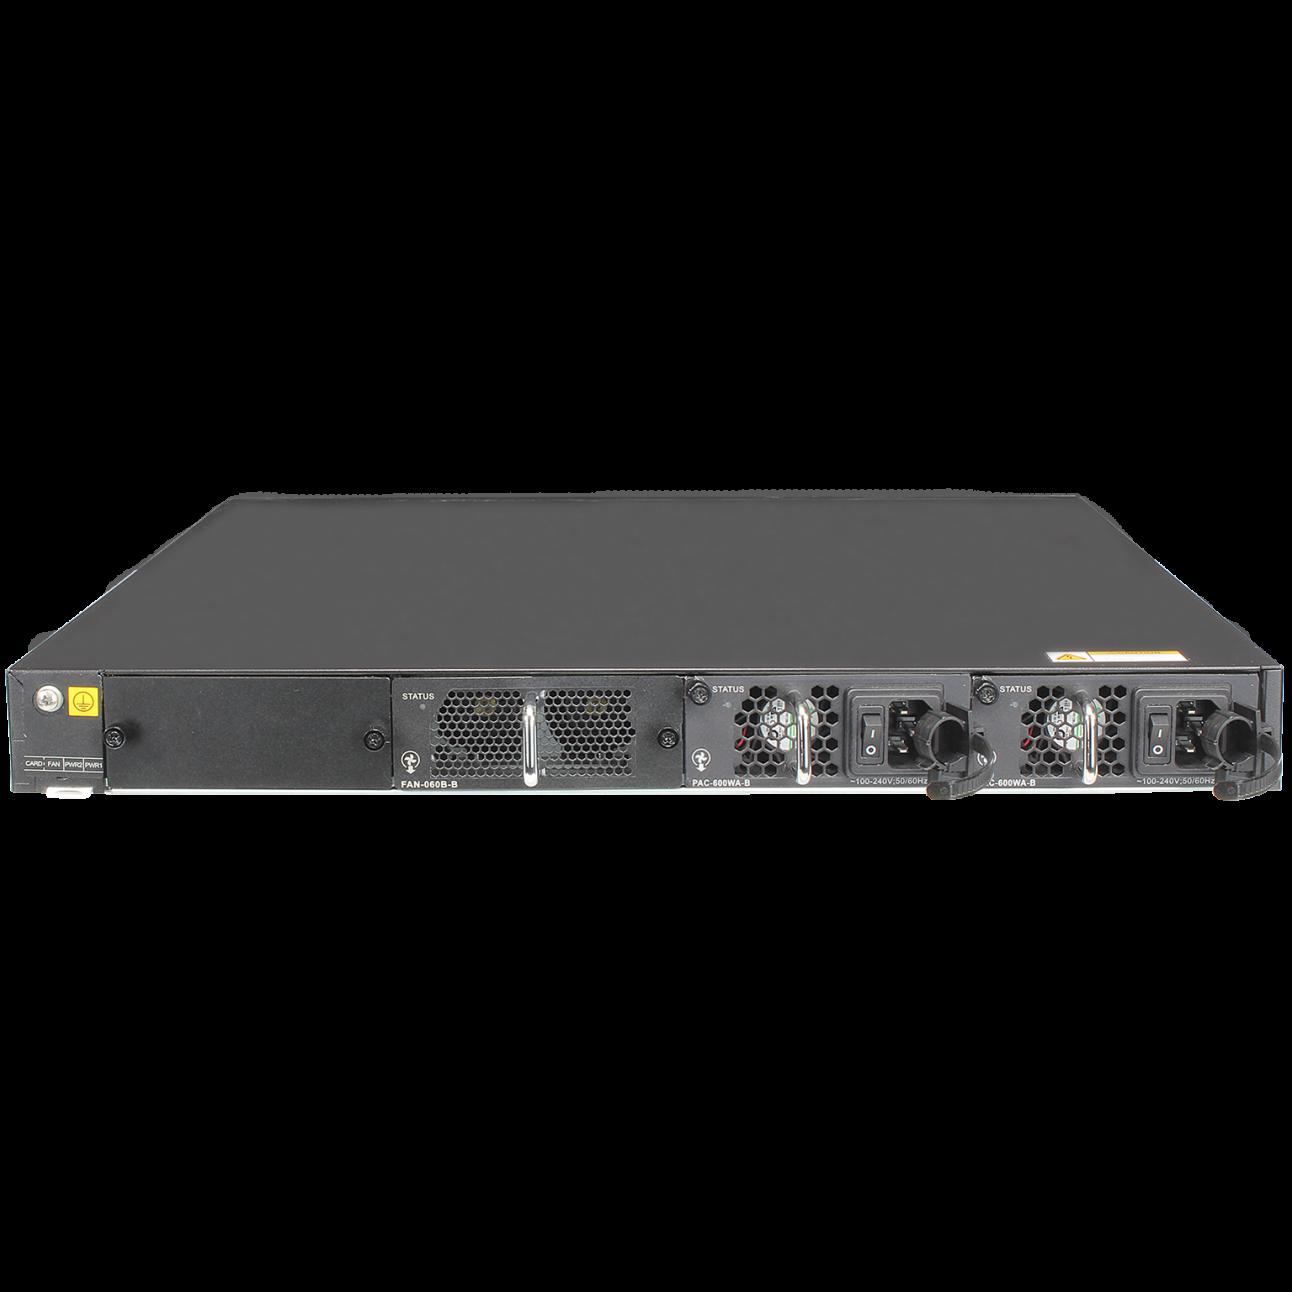 Коммутатор Huawei S6720-54C-EI-48S-AC